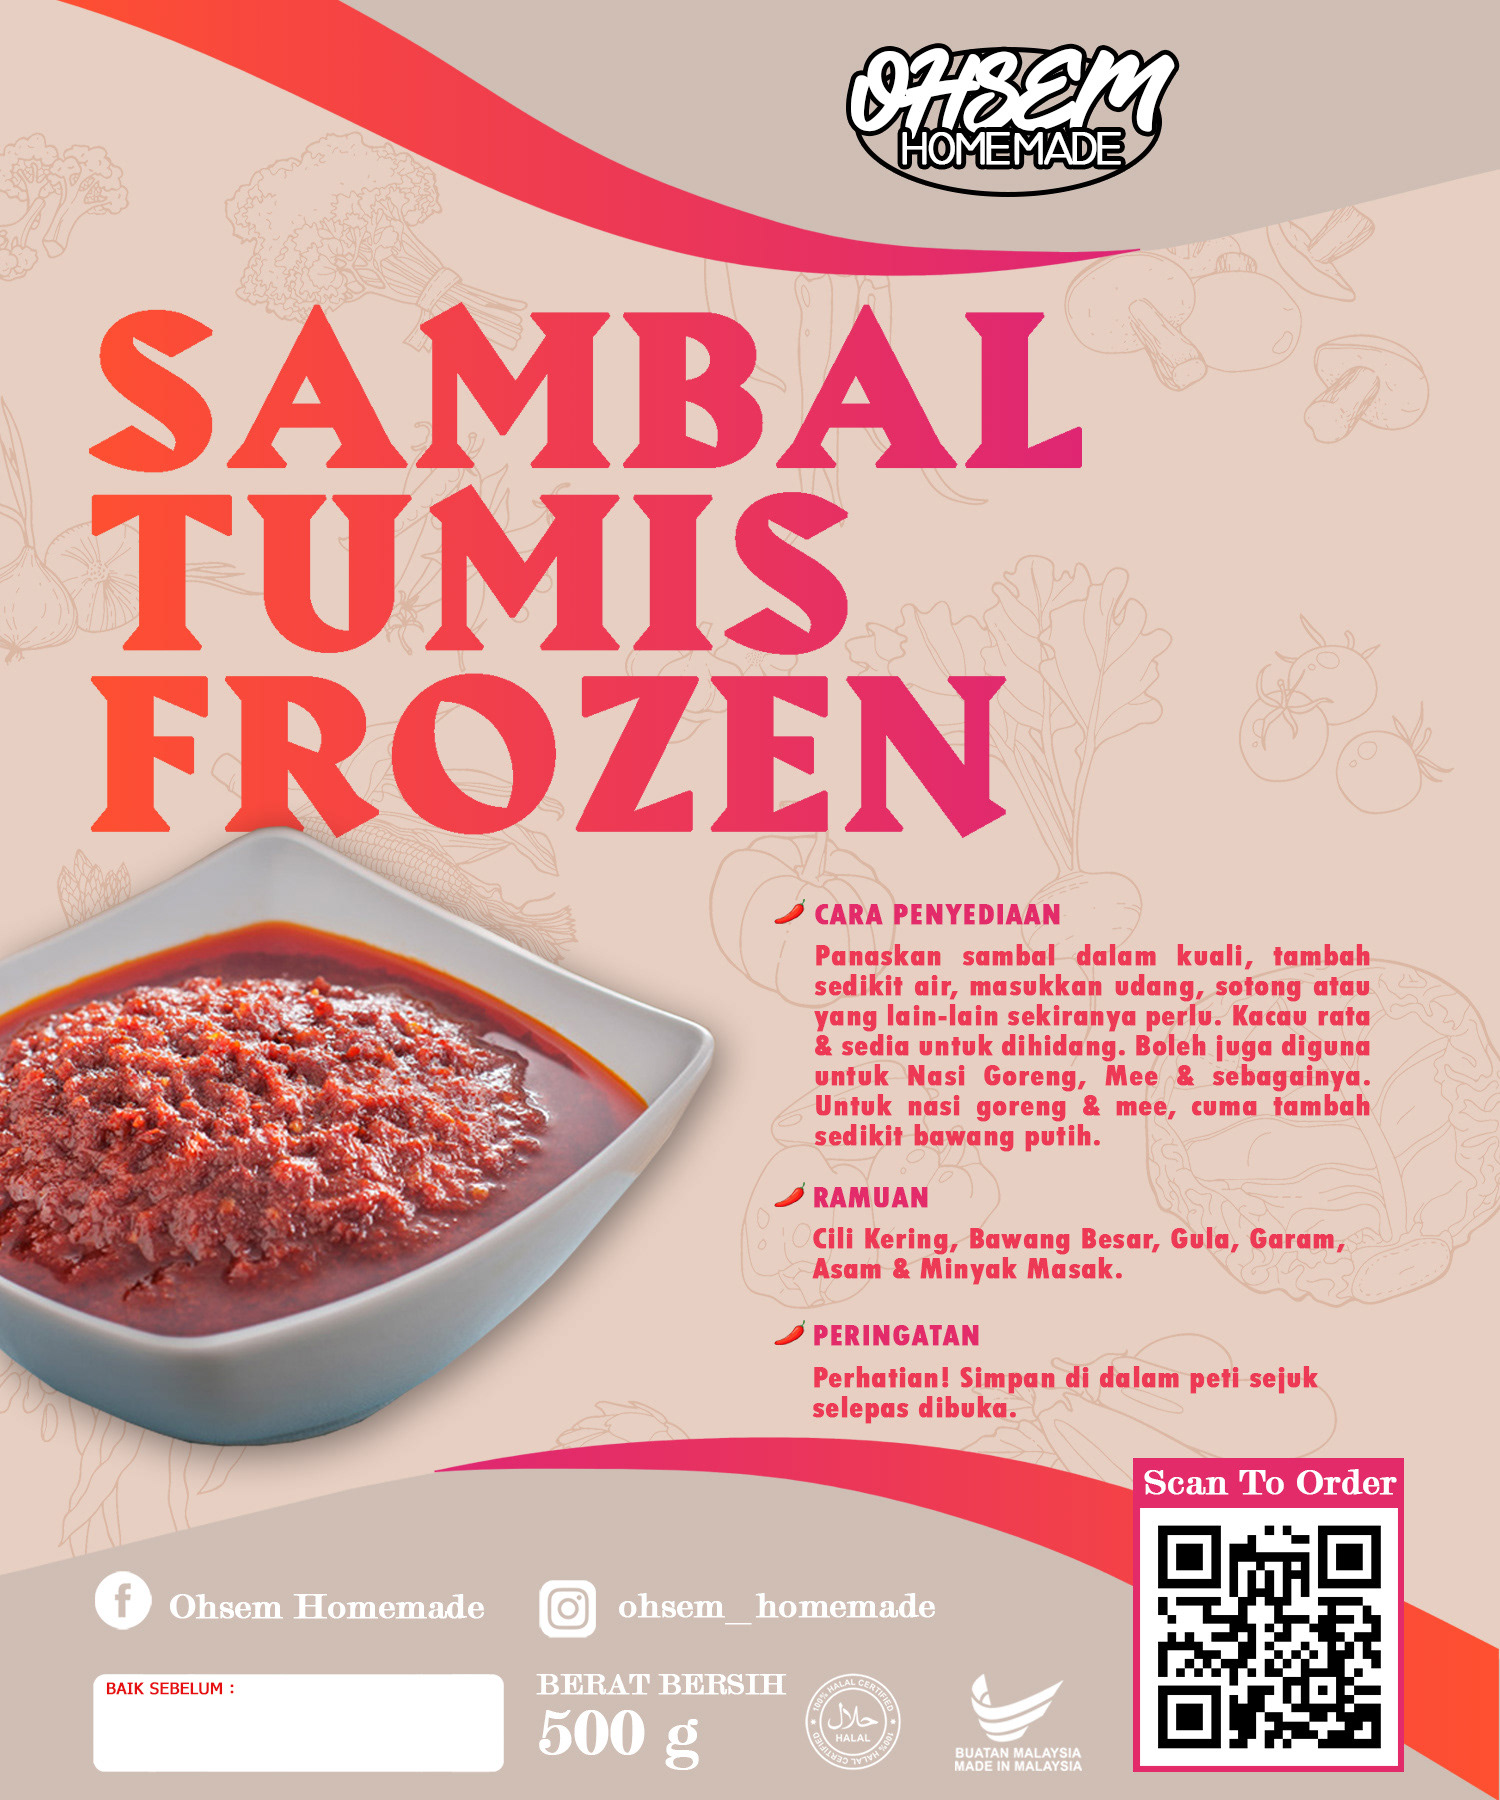 Sambal Andaliman Mamak Projects Photos Videos Logos Illustrations And Branding On Behance